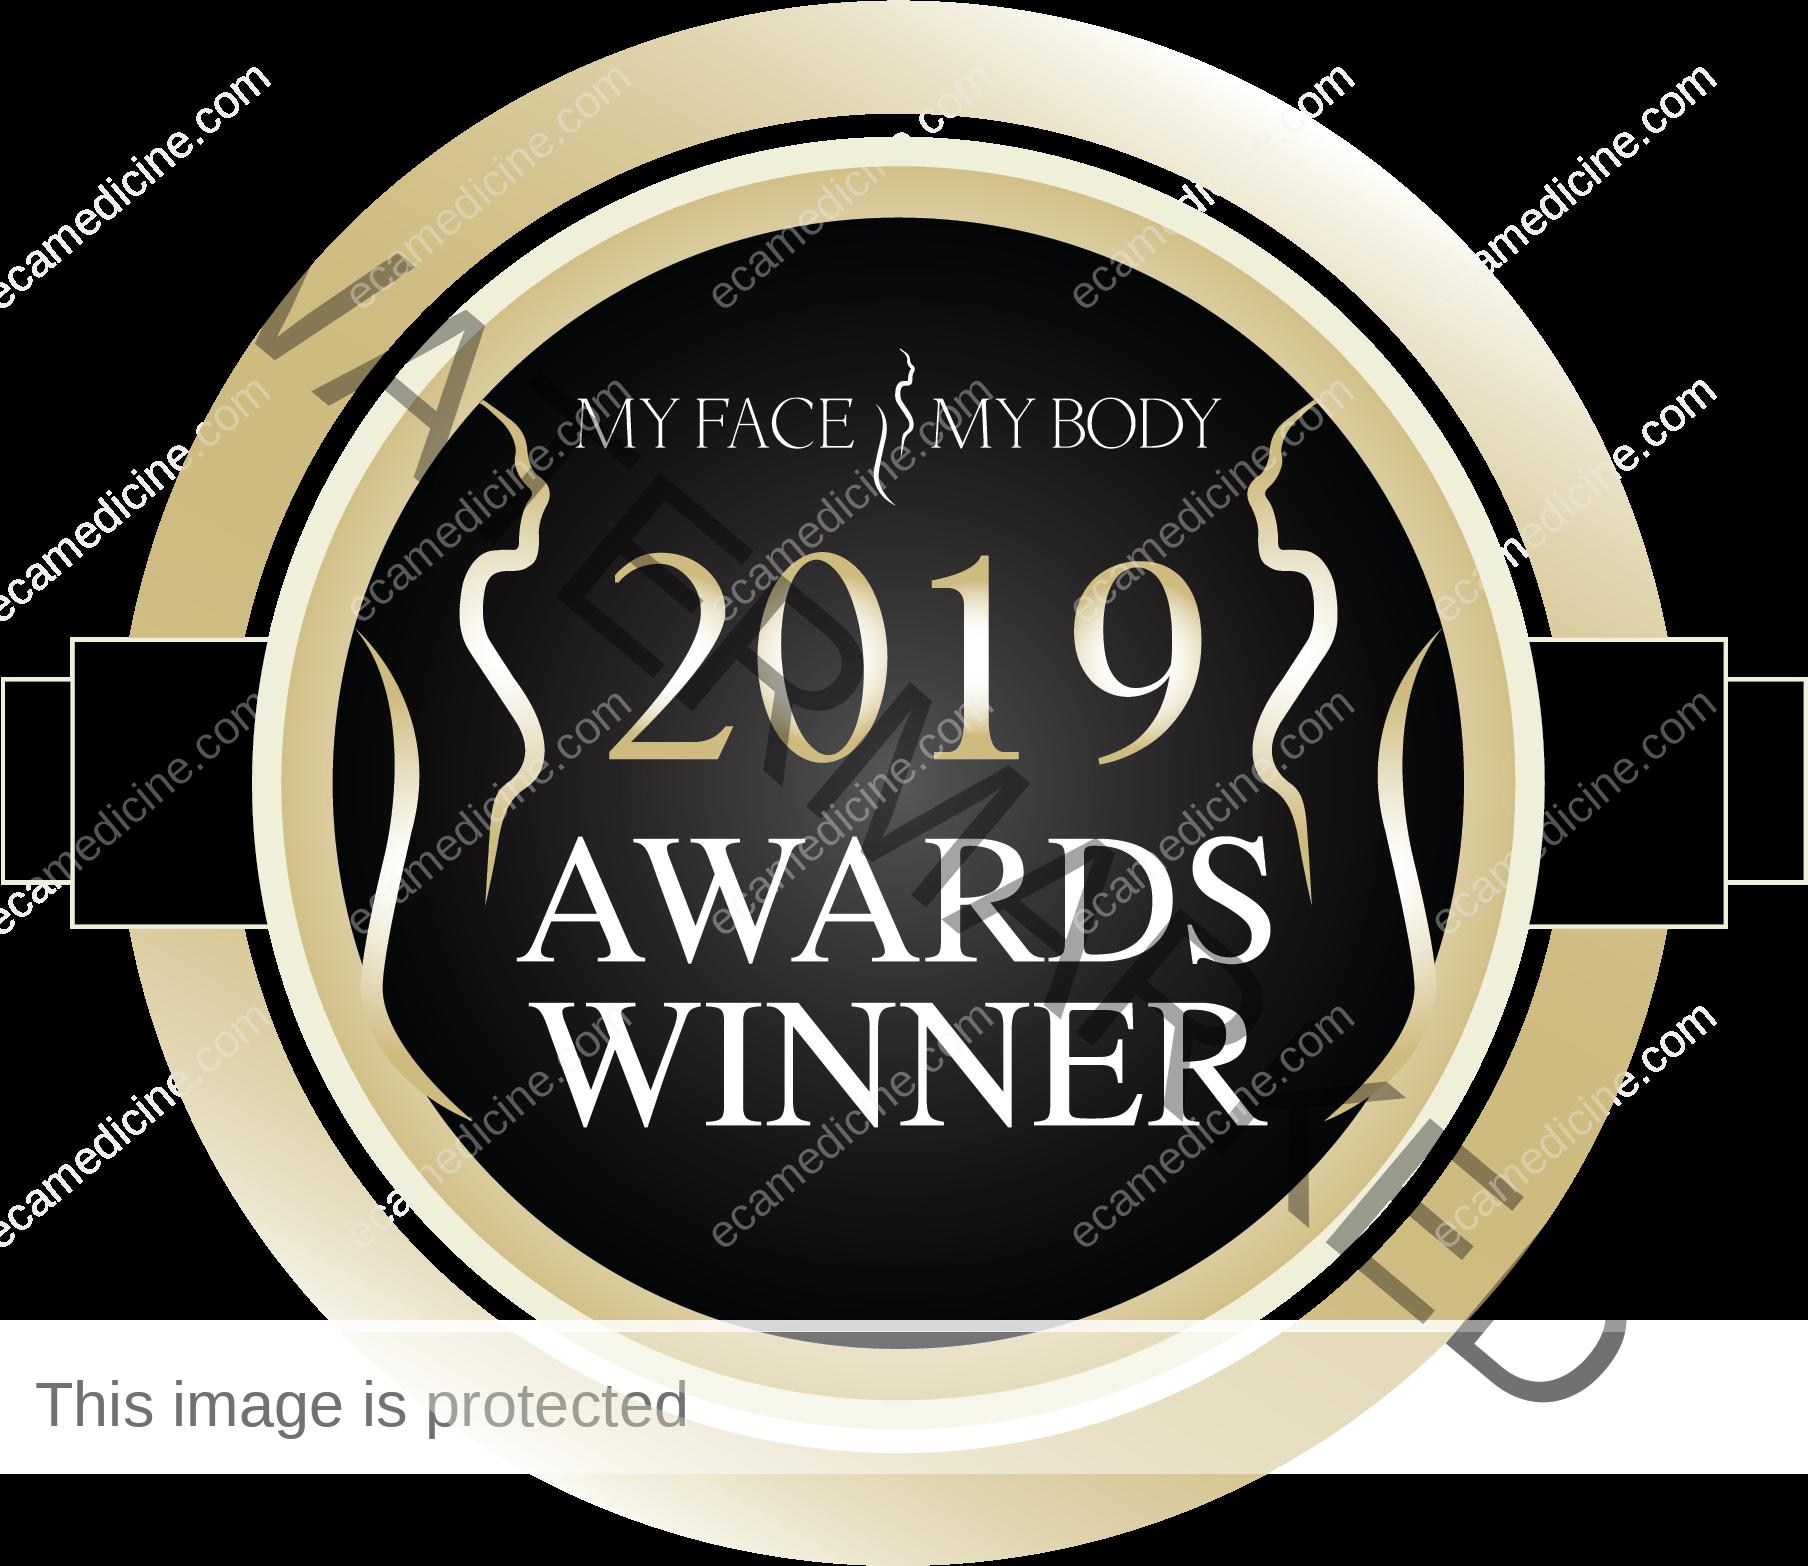 Winner Awards Digital Badge 2019